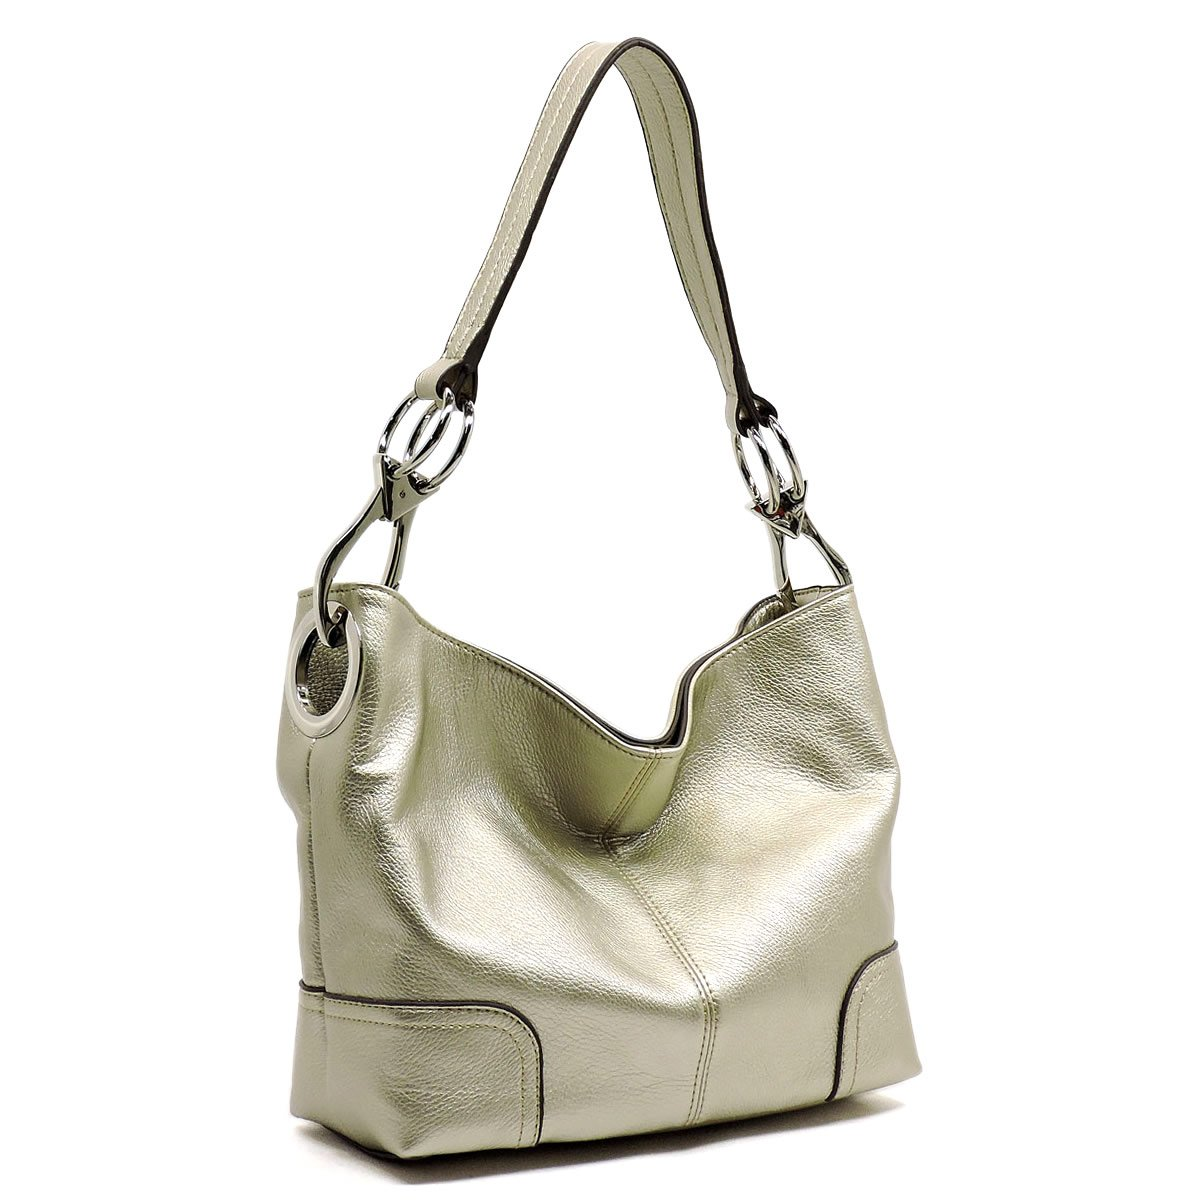 Americana Bucket Style Hobo Shoulder Bag with Big Snap Hook Hardware